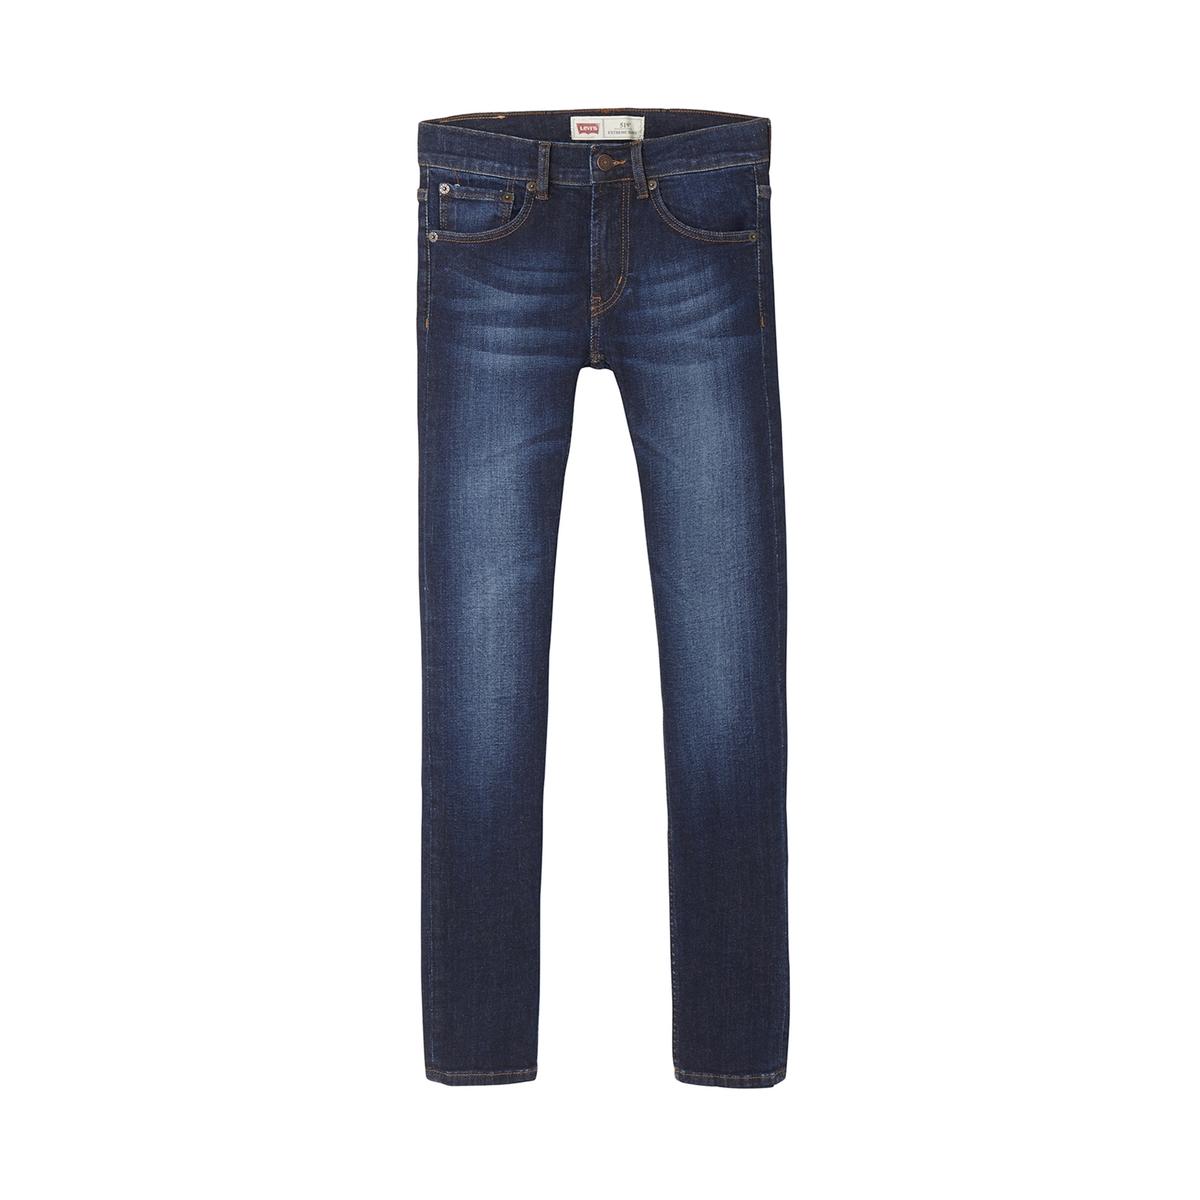 Jeans extreme skinny taglio 519 3 - 16 anni